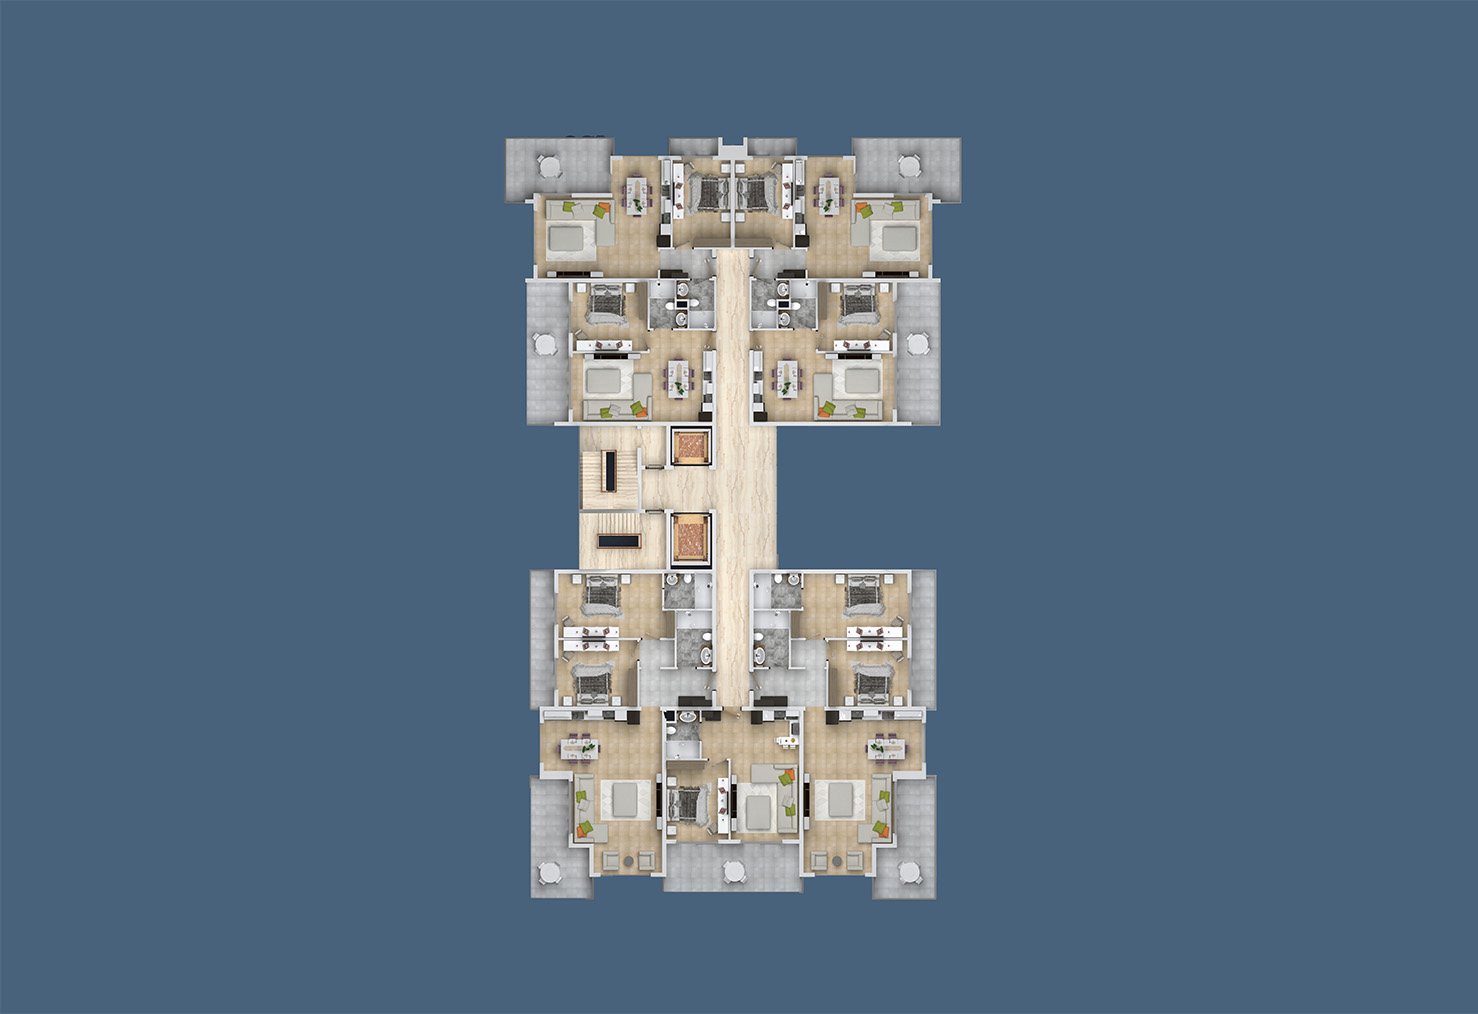 План расположения квартир 4 этаж «B» Yekta Kingdom Trade Center